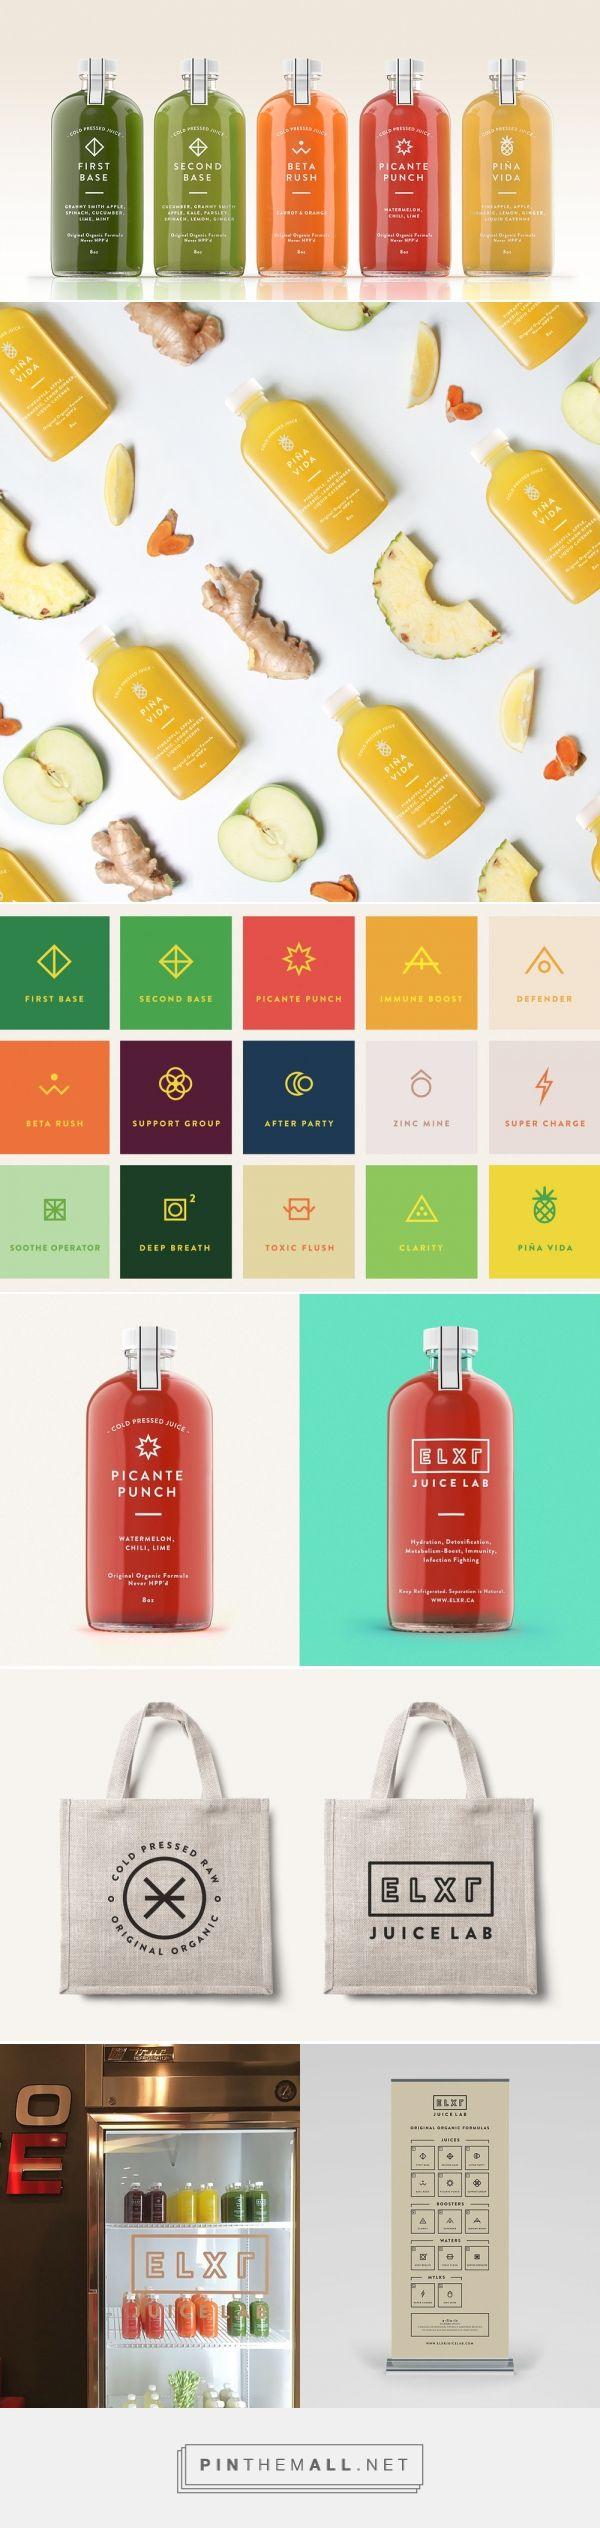 ELXR Juice Lab — The Dieline - Branding & Packaging - created via http://pinthemall.net